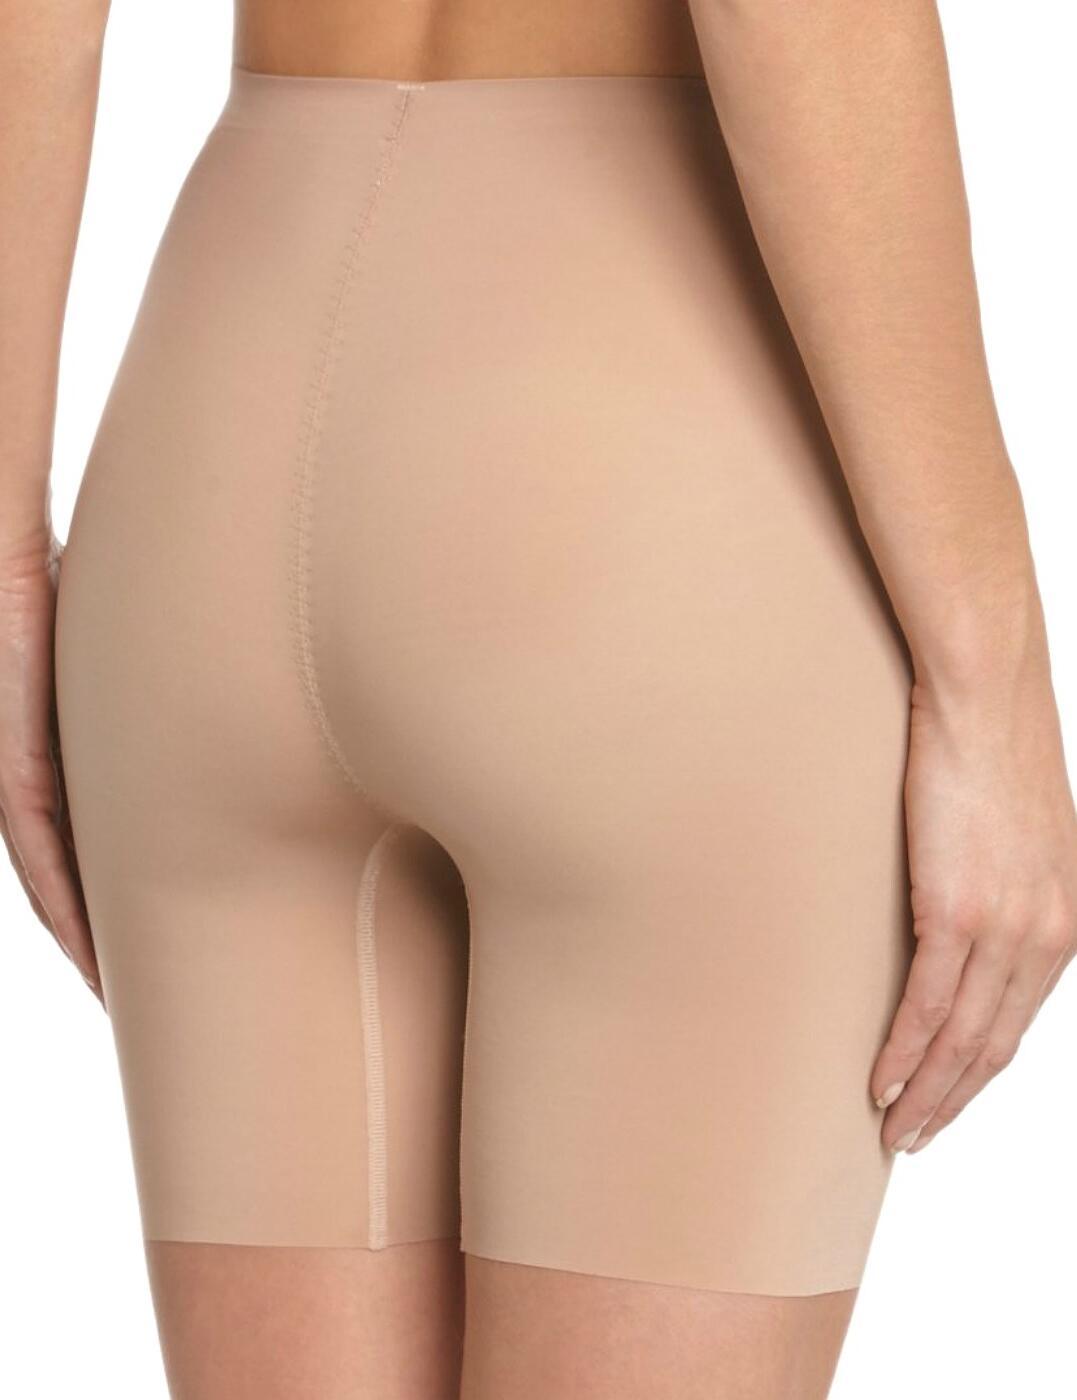 Wacoal-Beauty-Secret-Lift-Up-Shaping-Slimming-Panty-GRA541-Wacoal-Shapewear Indexbild 7